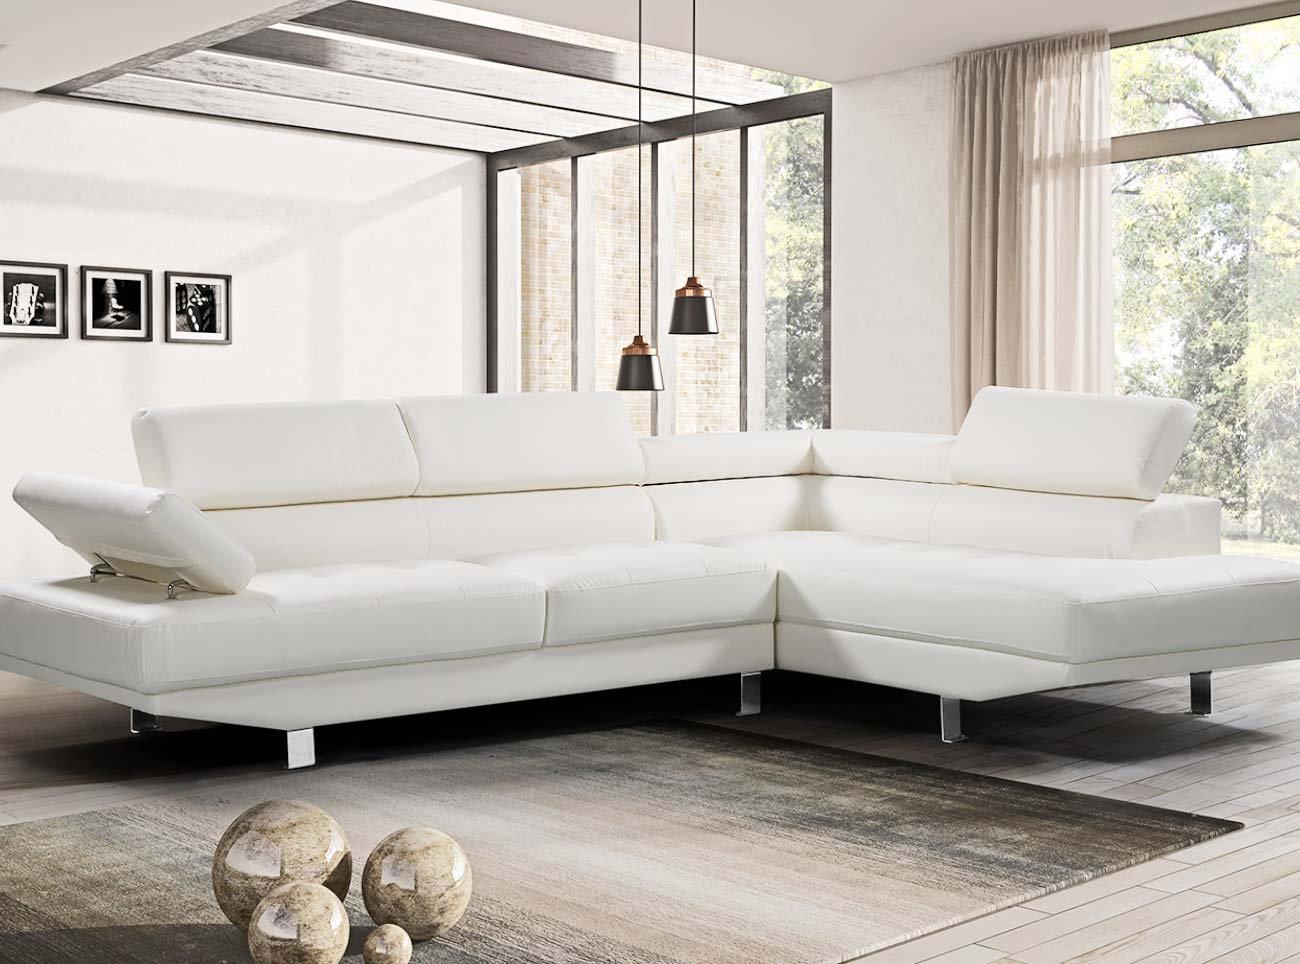 Amazon com harperbright designs 2 piece pu leather sectional sofa living room modern furniture adjustable armrests white kitchen dining